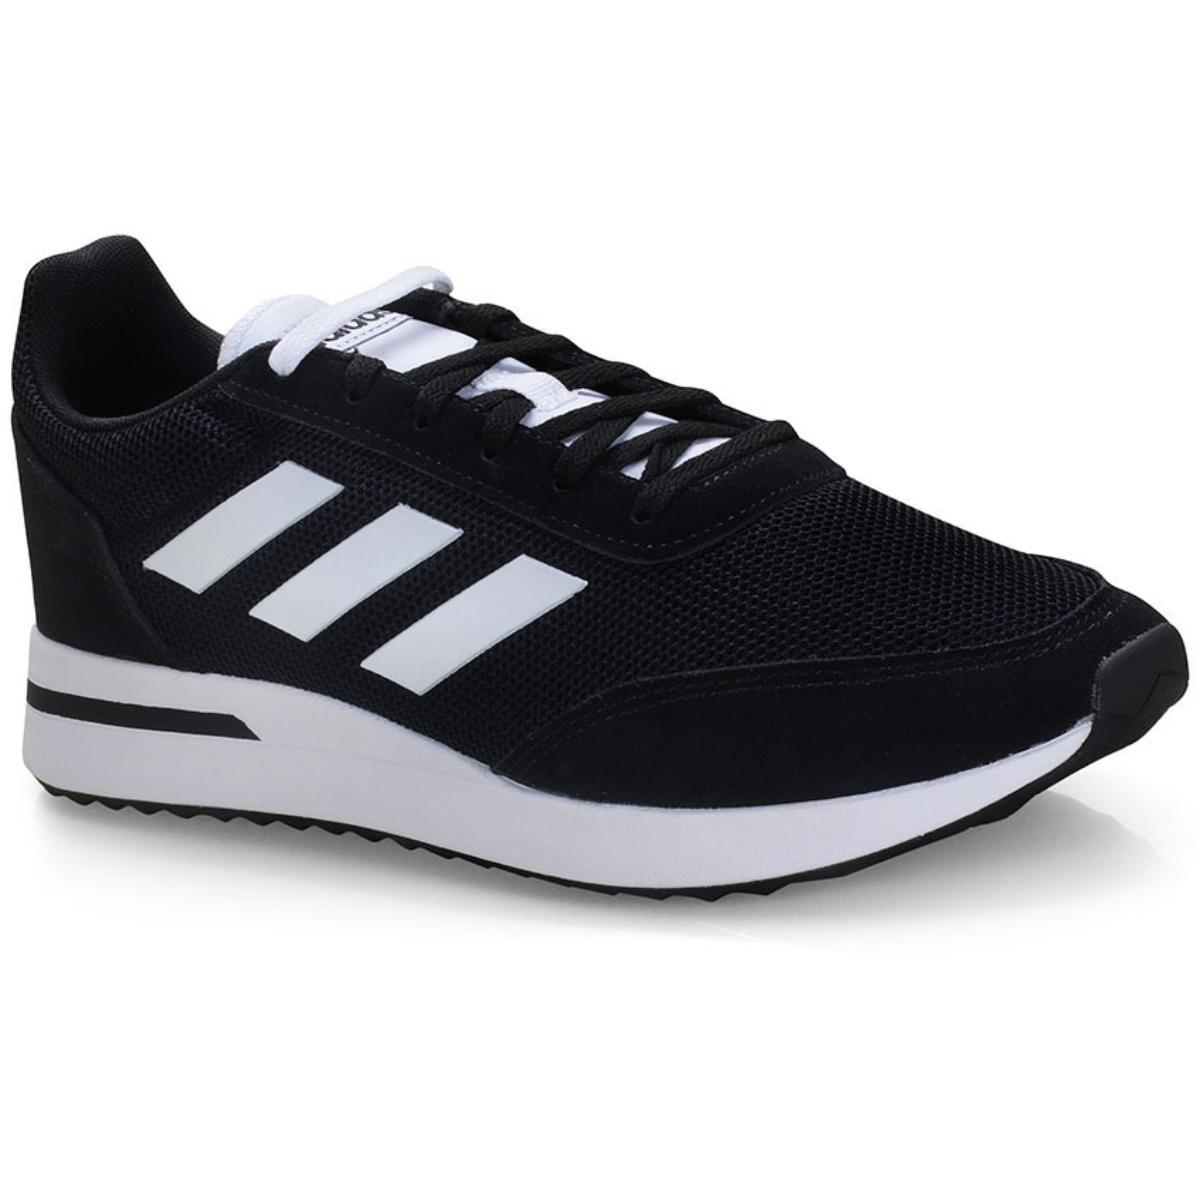 Tênis Masculino Adidas Ee9752 Run70s Preto/branco